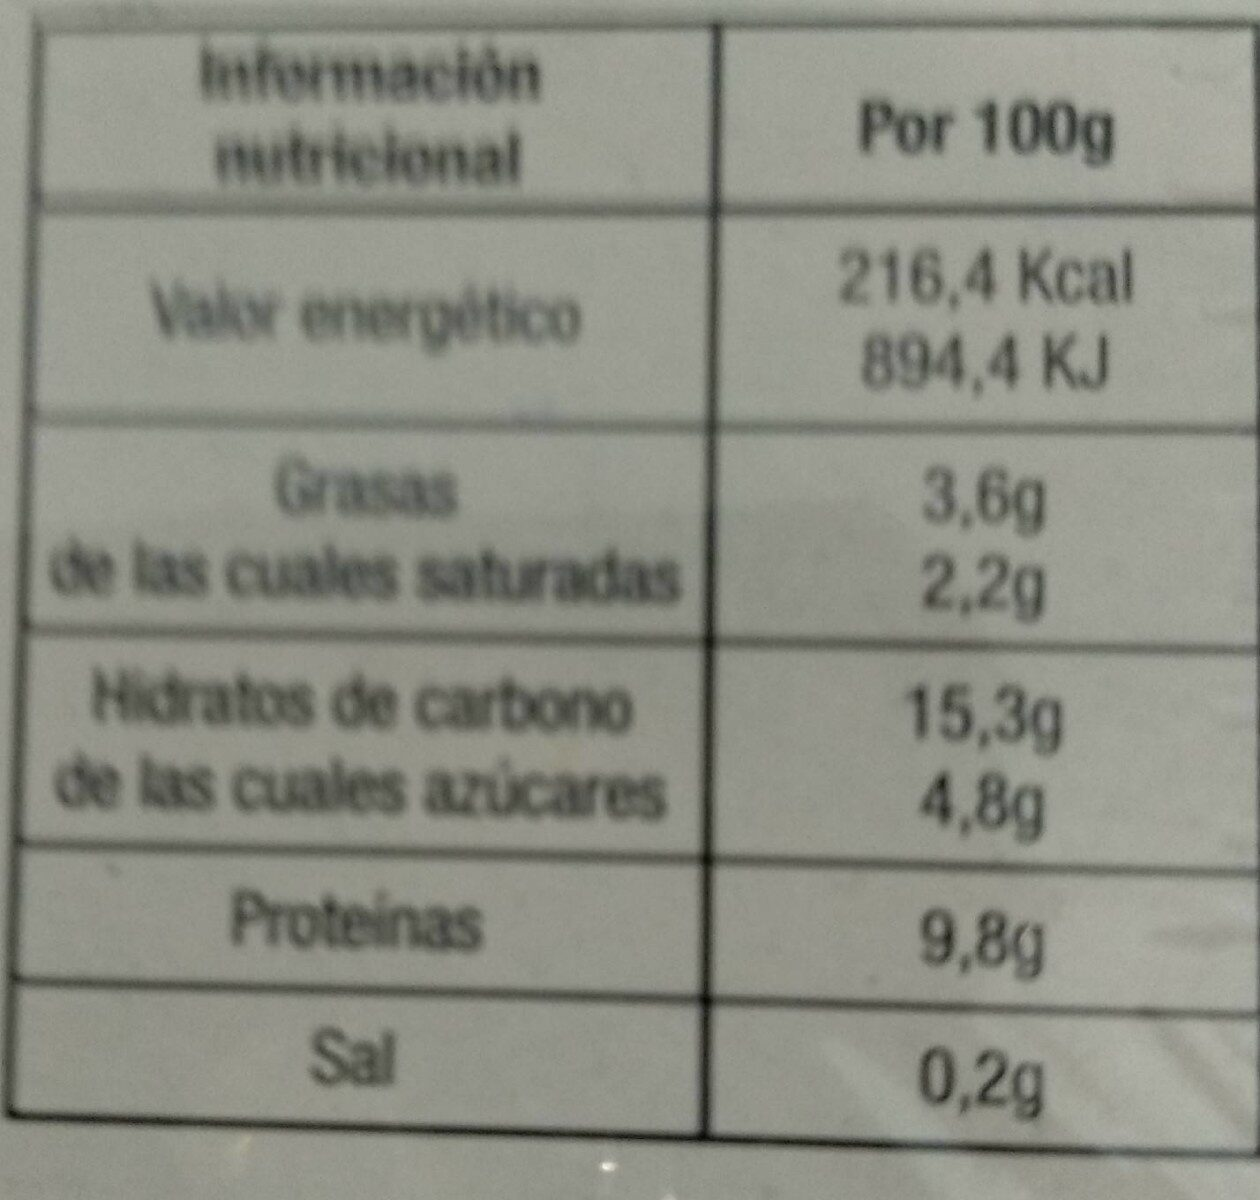 Guindillas picantes - Nutrition facts